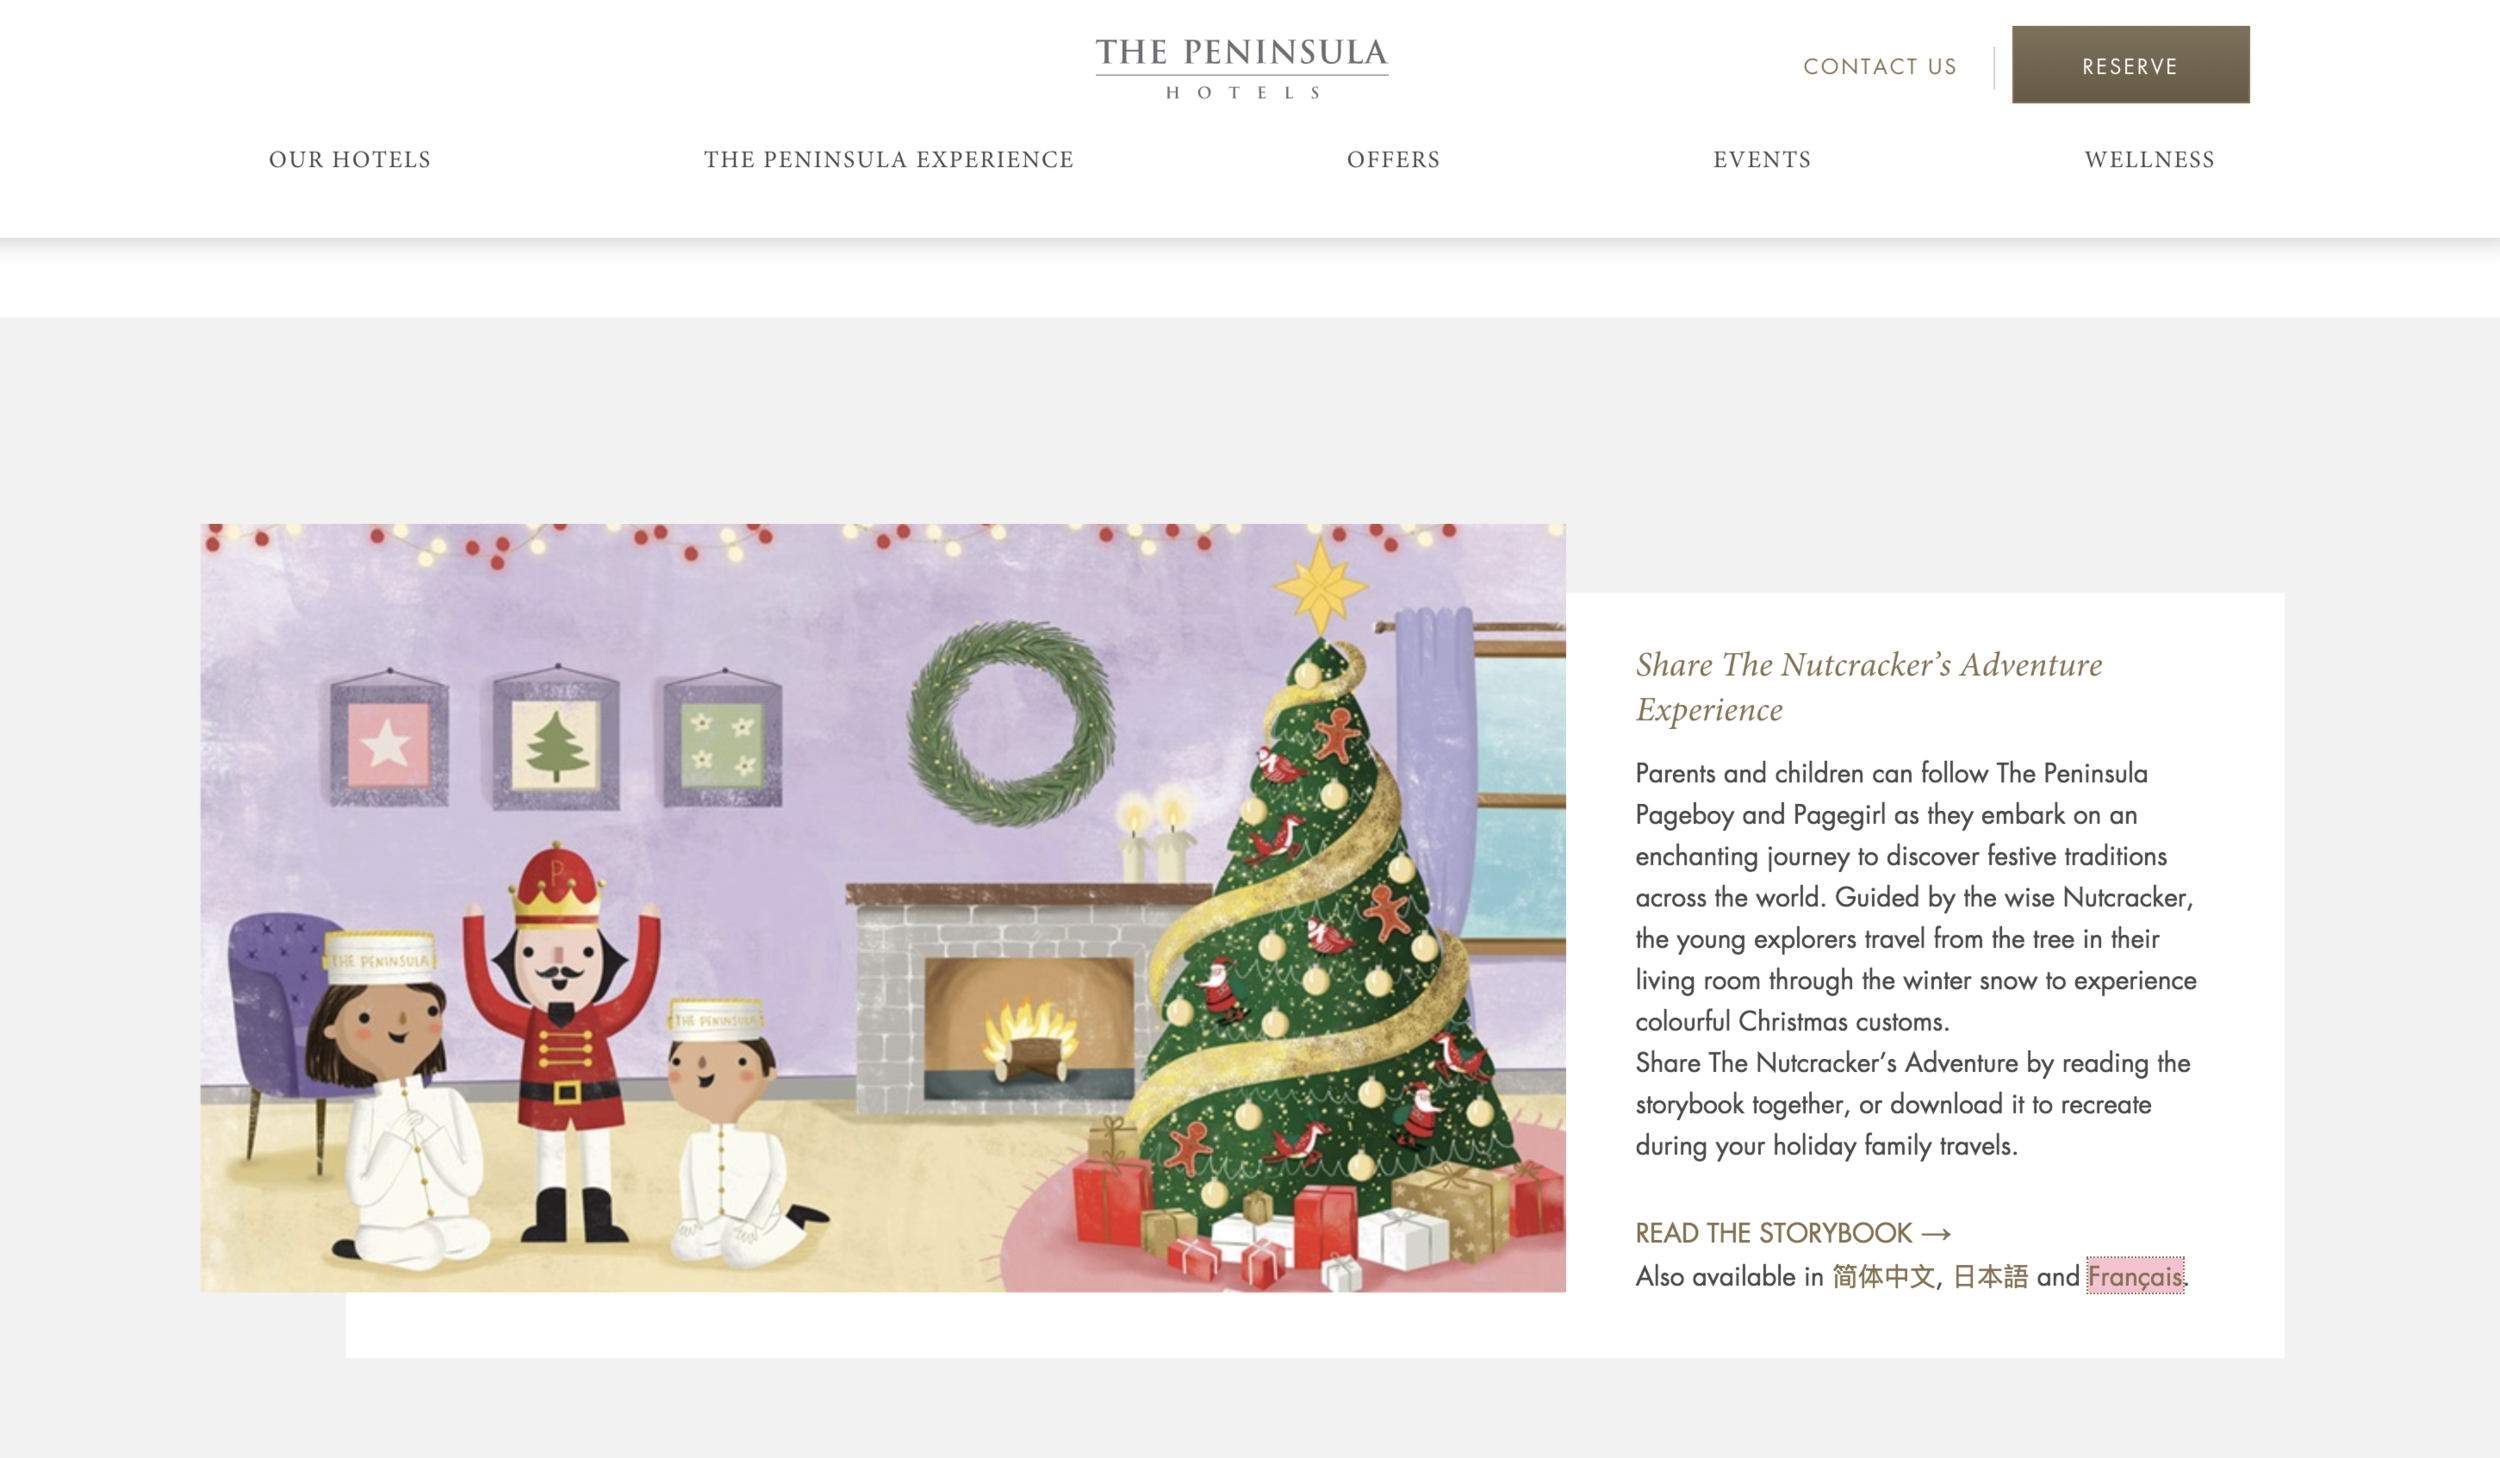 Festive stories - Peninsula Hotel - Website - Gina Maldonado.png